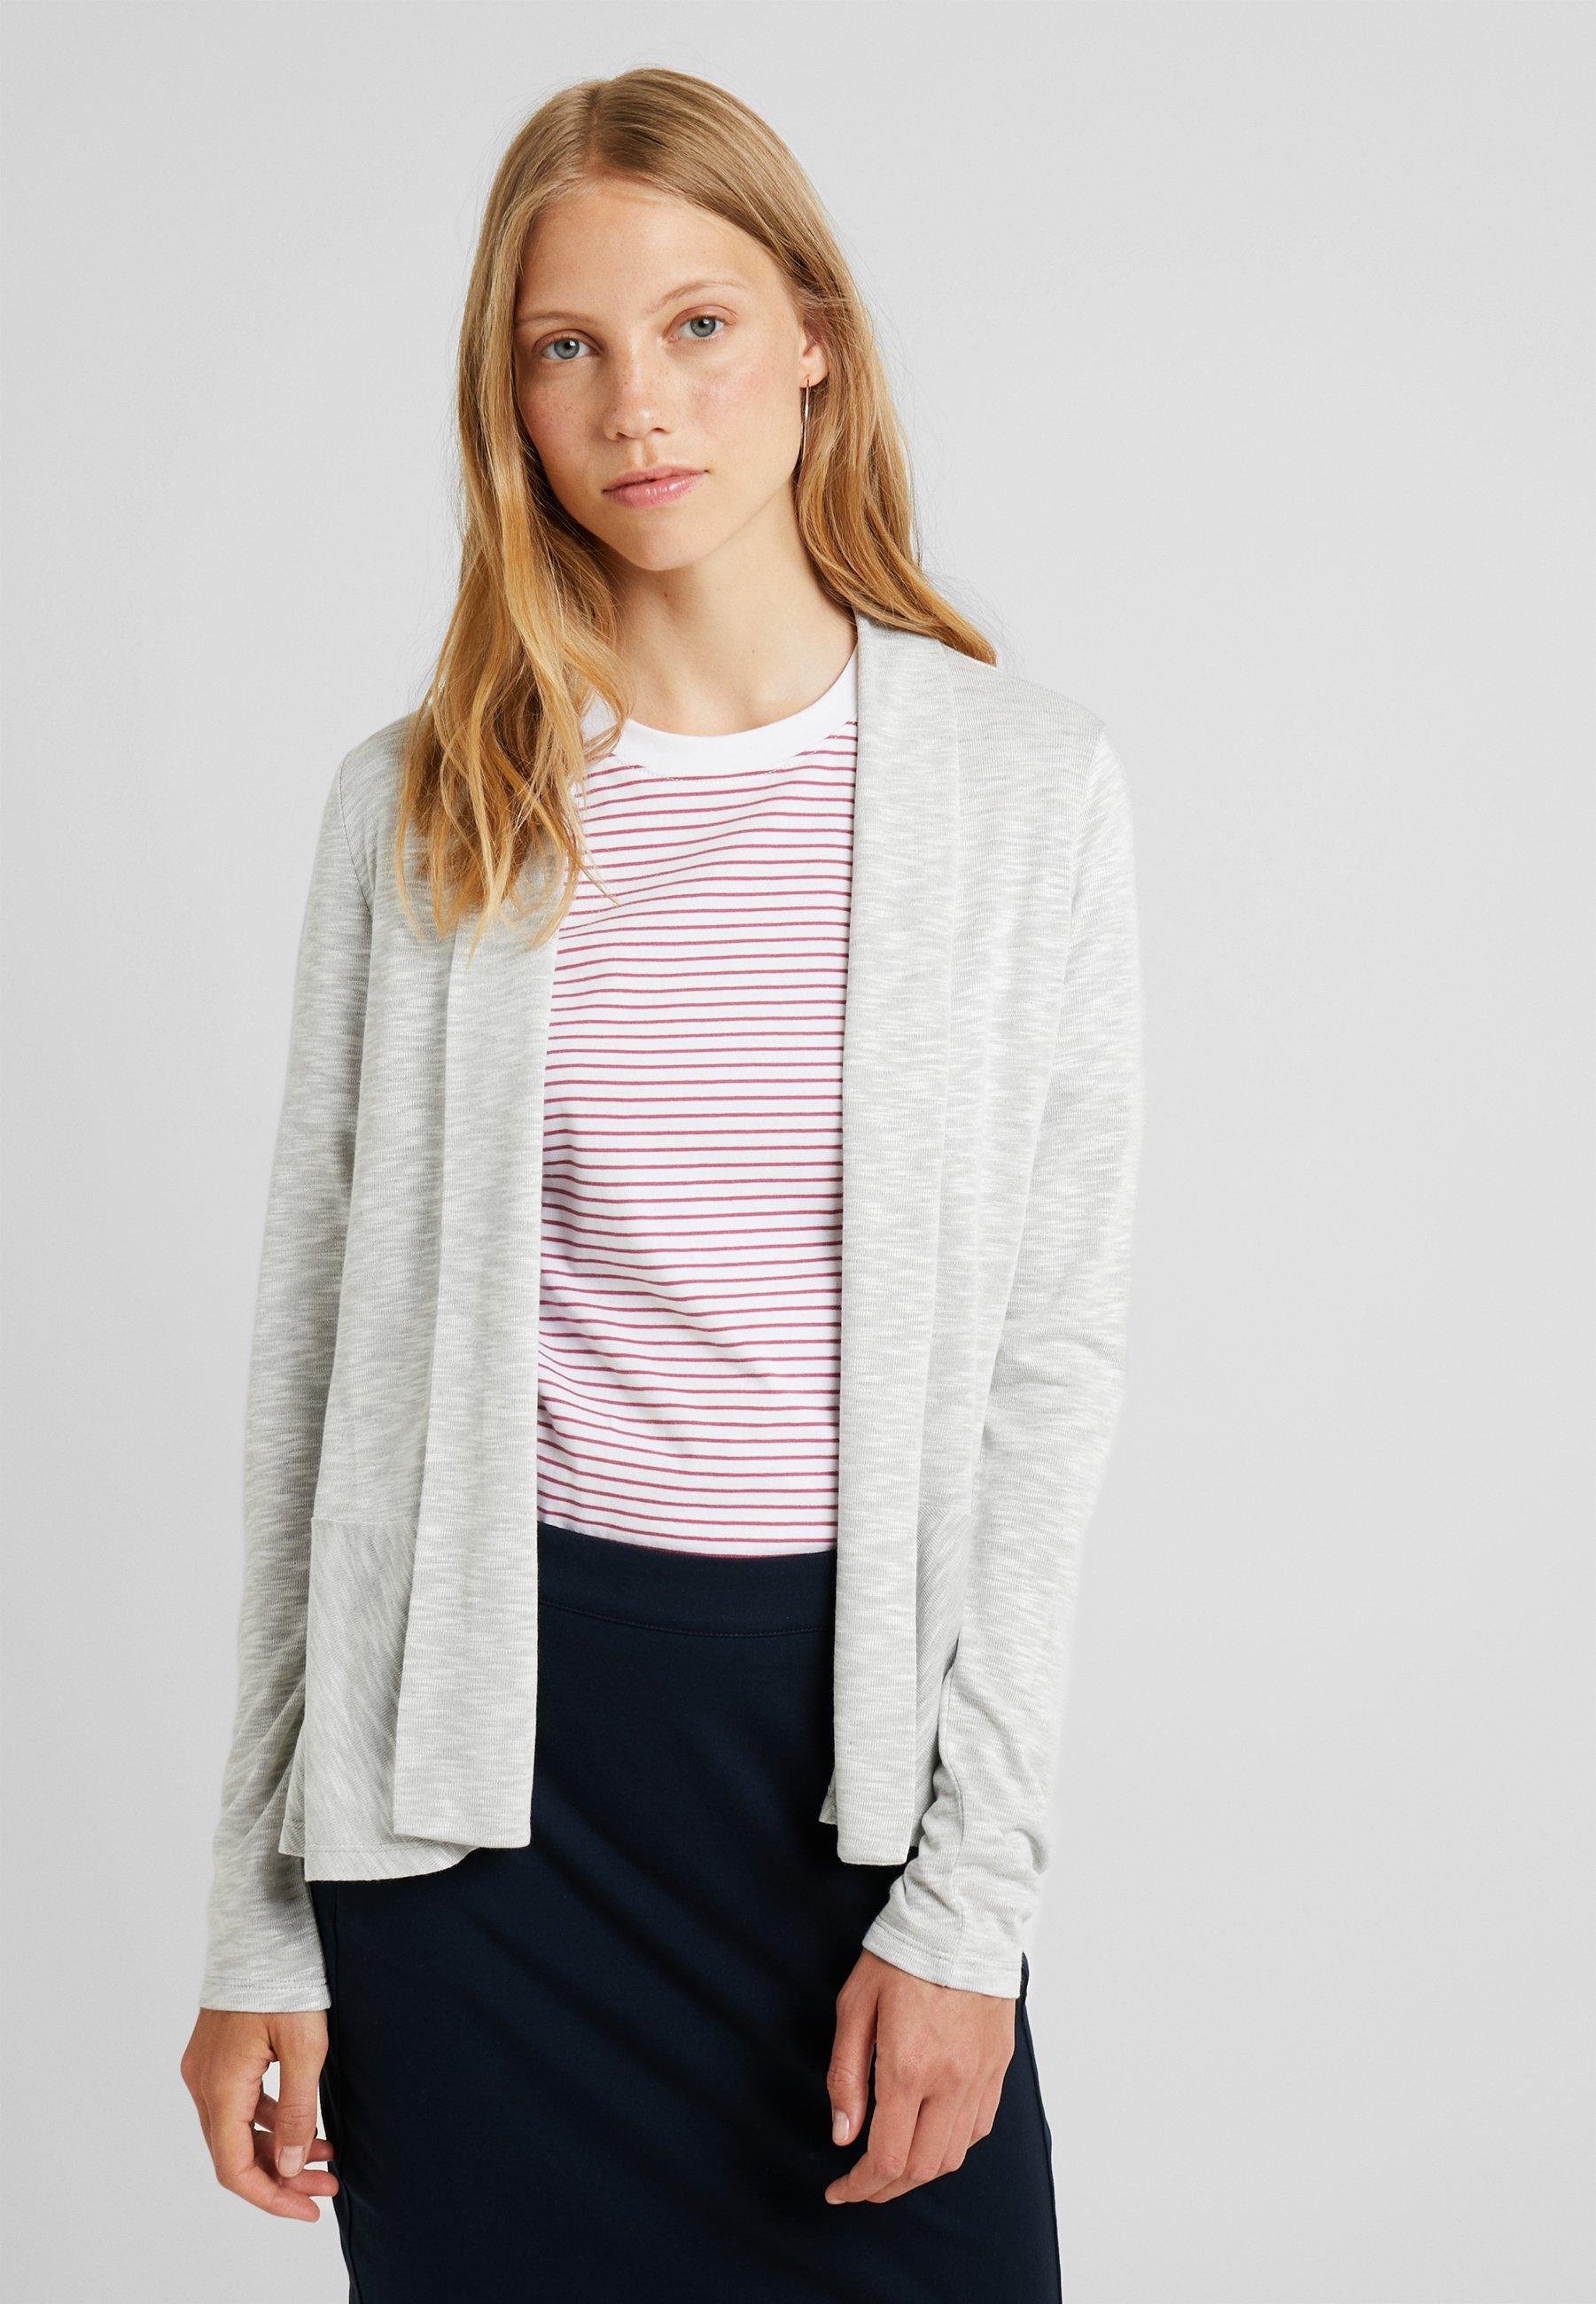 Esprit CARDI - Vest - light grey - Dames jas Ontwerper